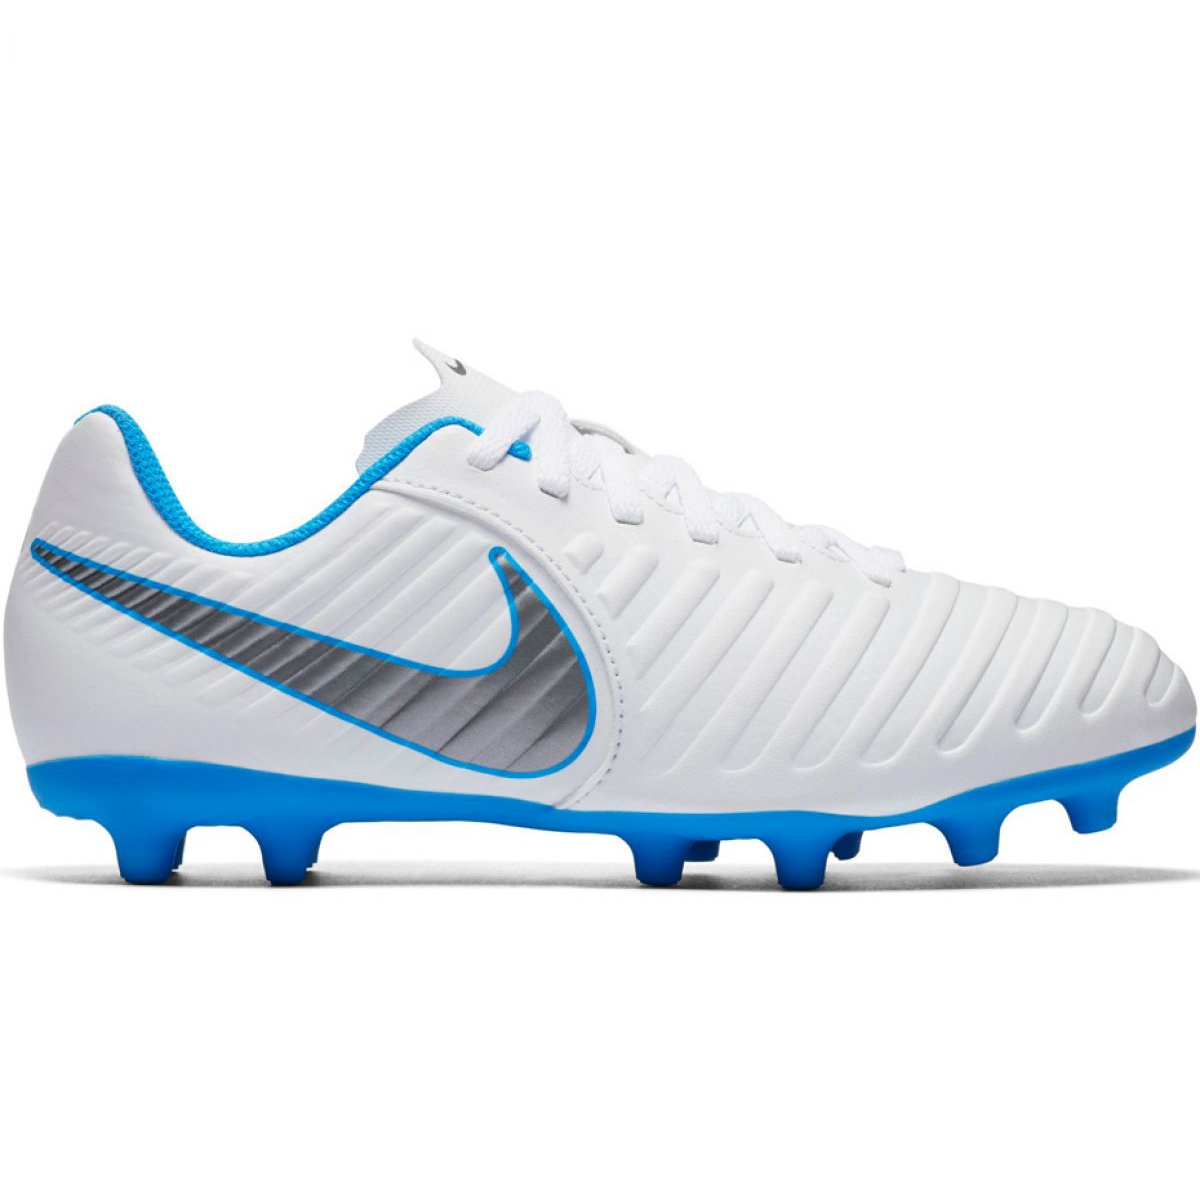 Nike TIEMPO LEGEND VII CLUB fehér 6 Férfi futballcipő